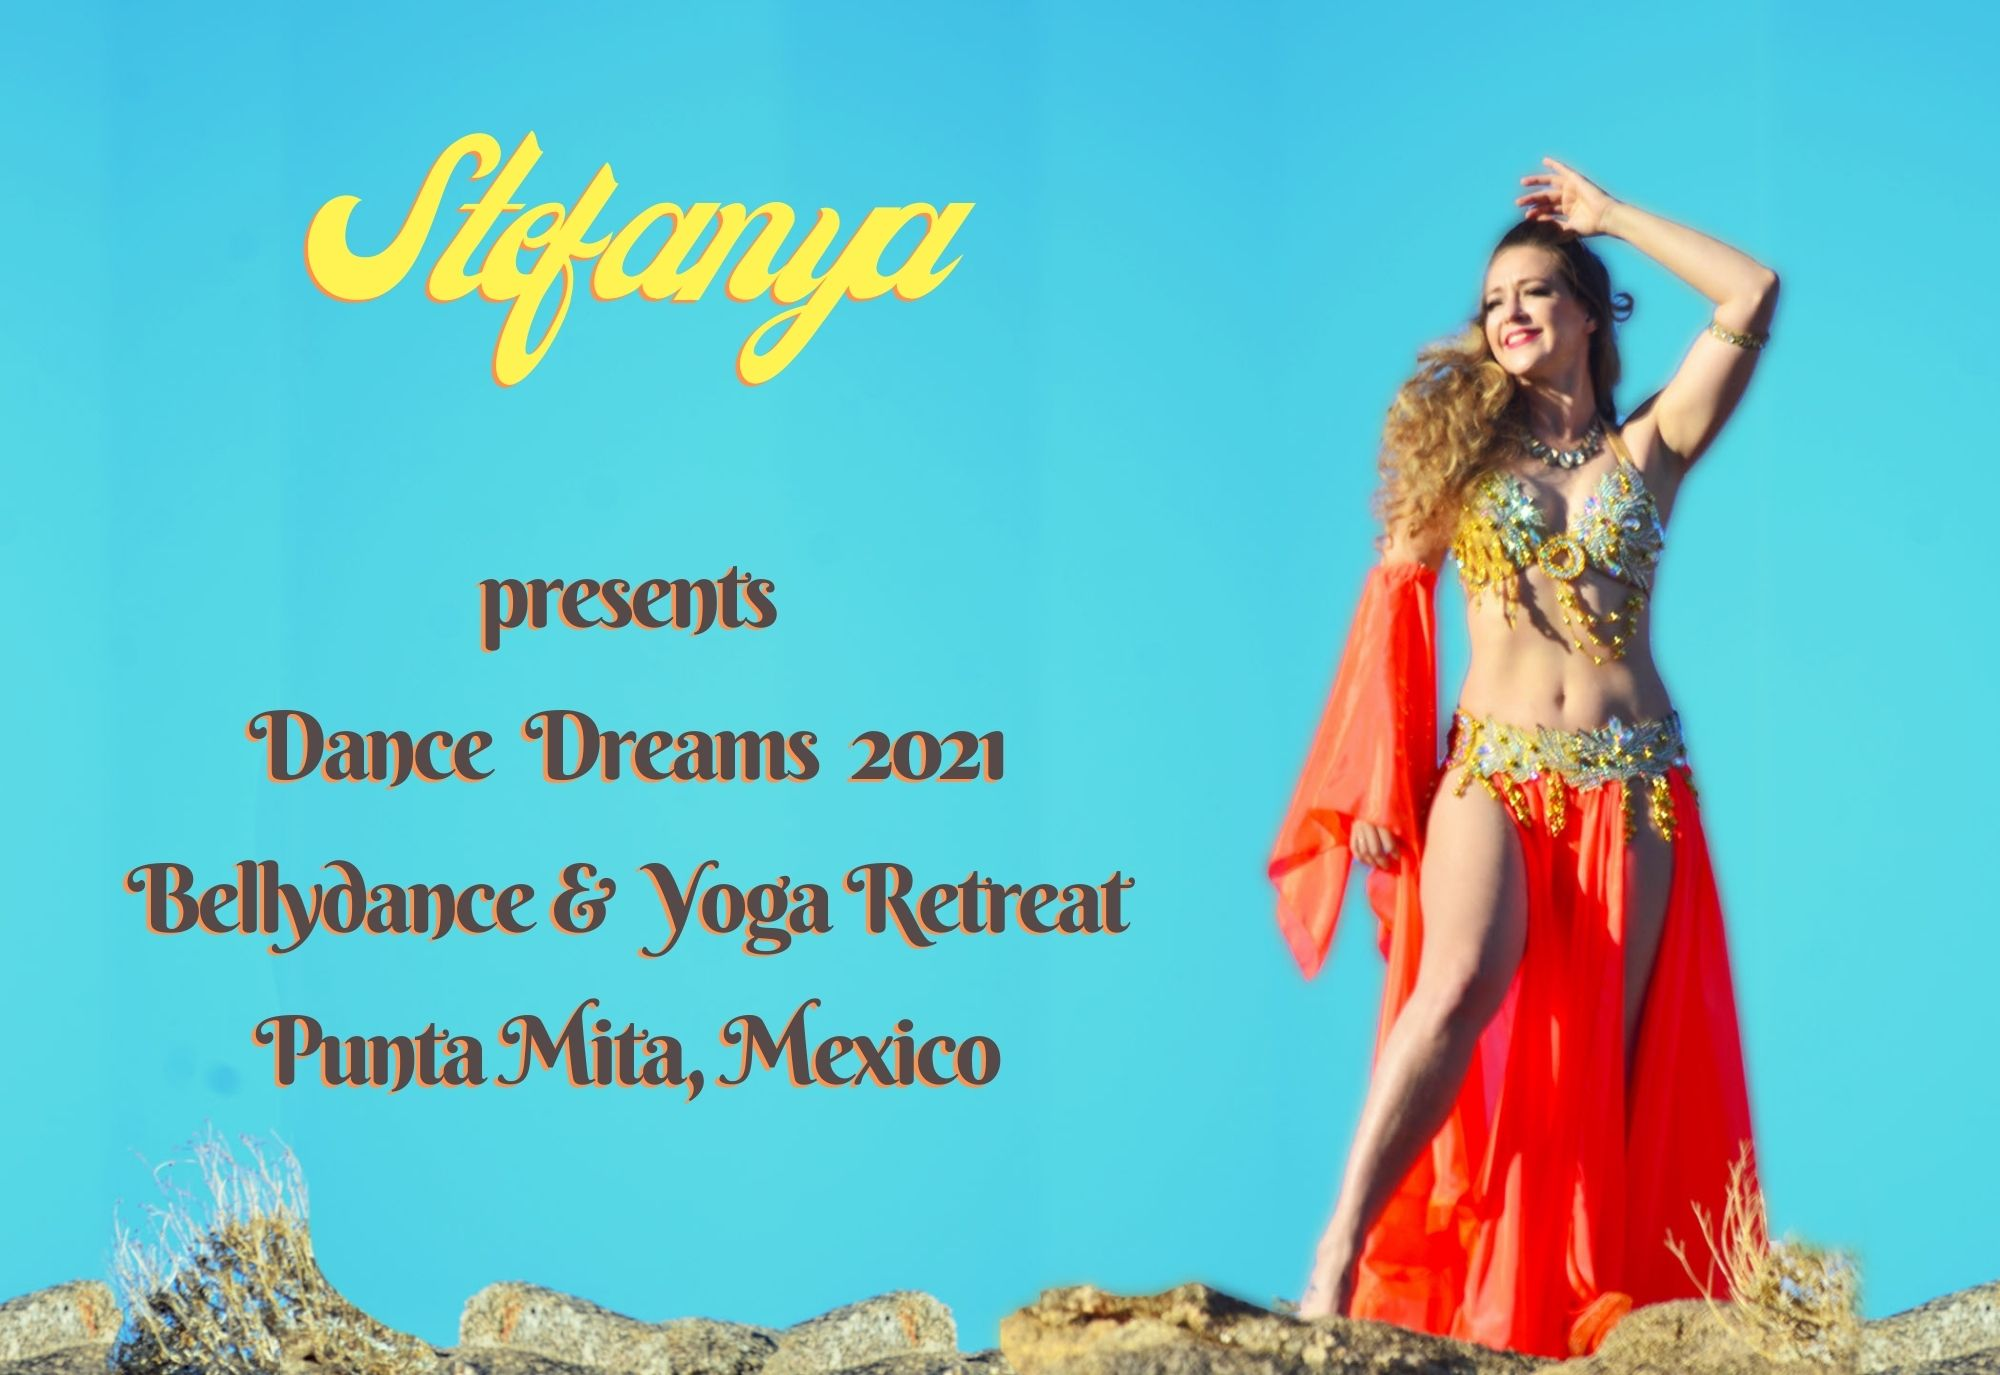 dance drear poster